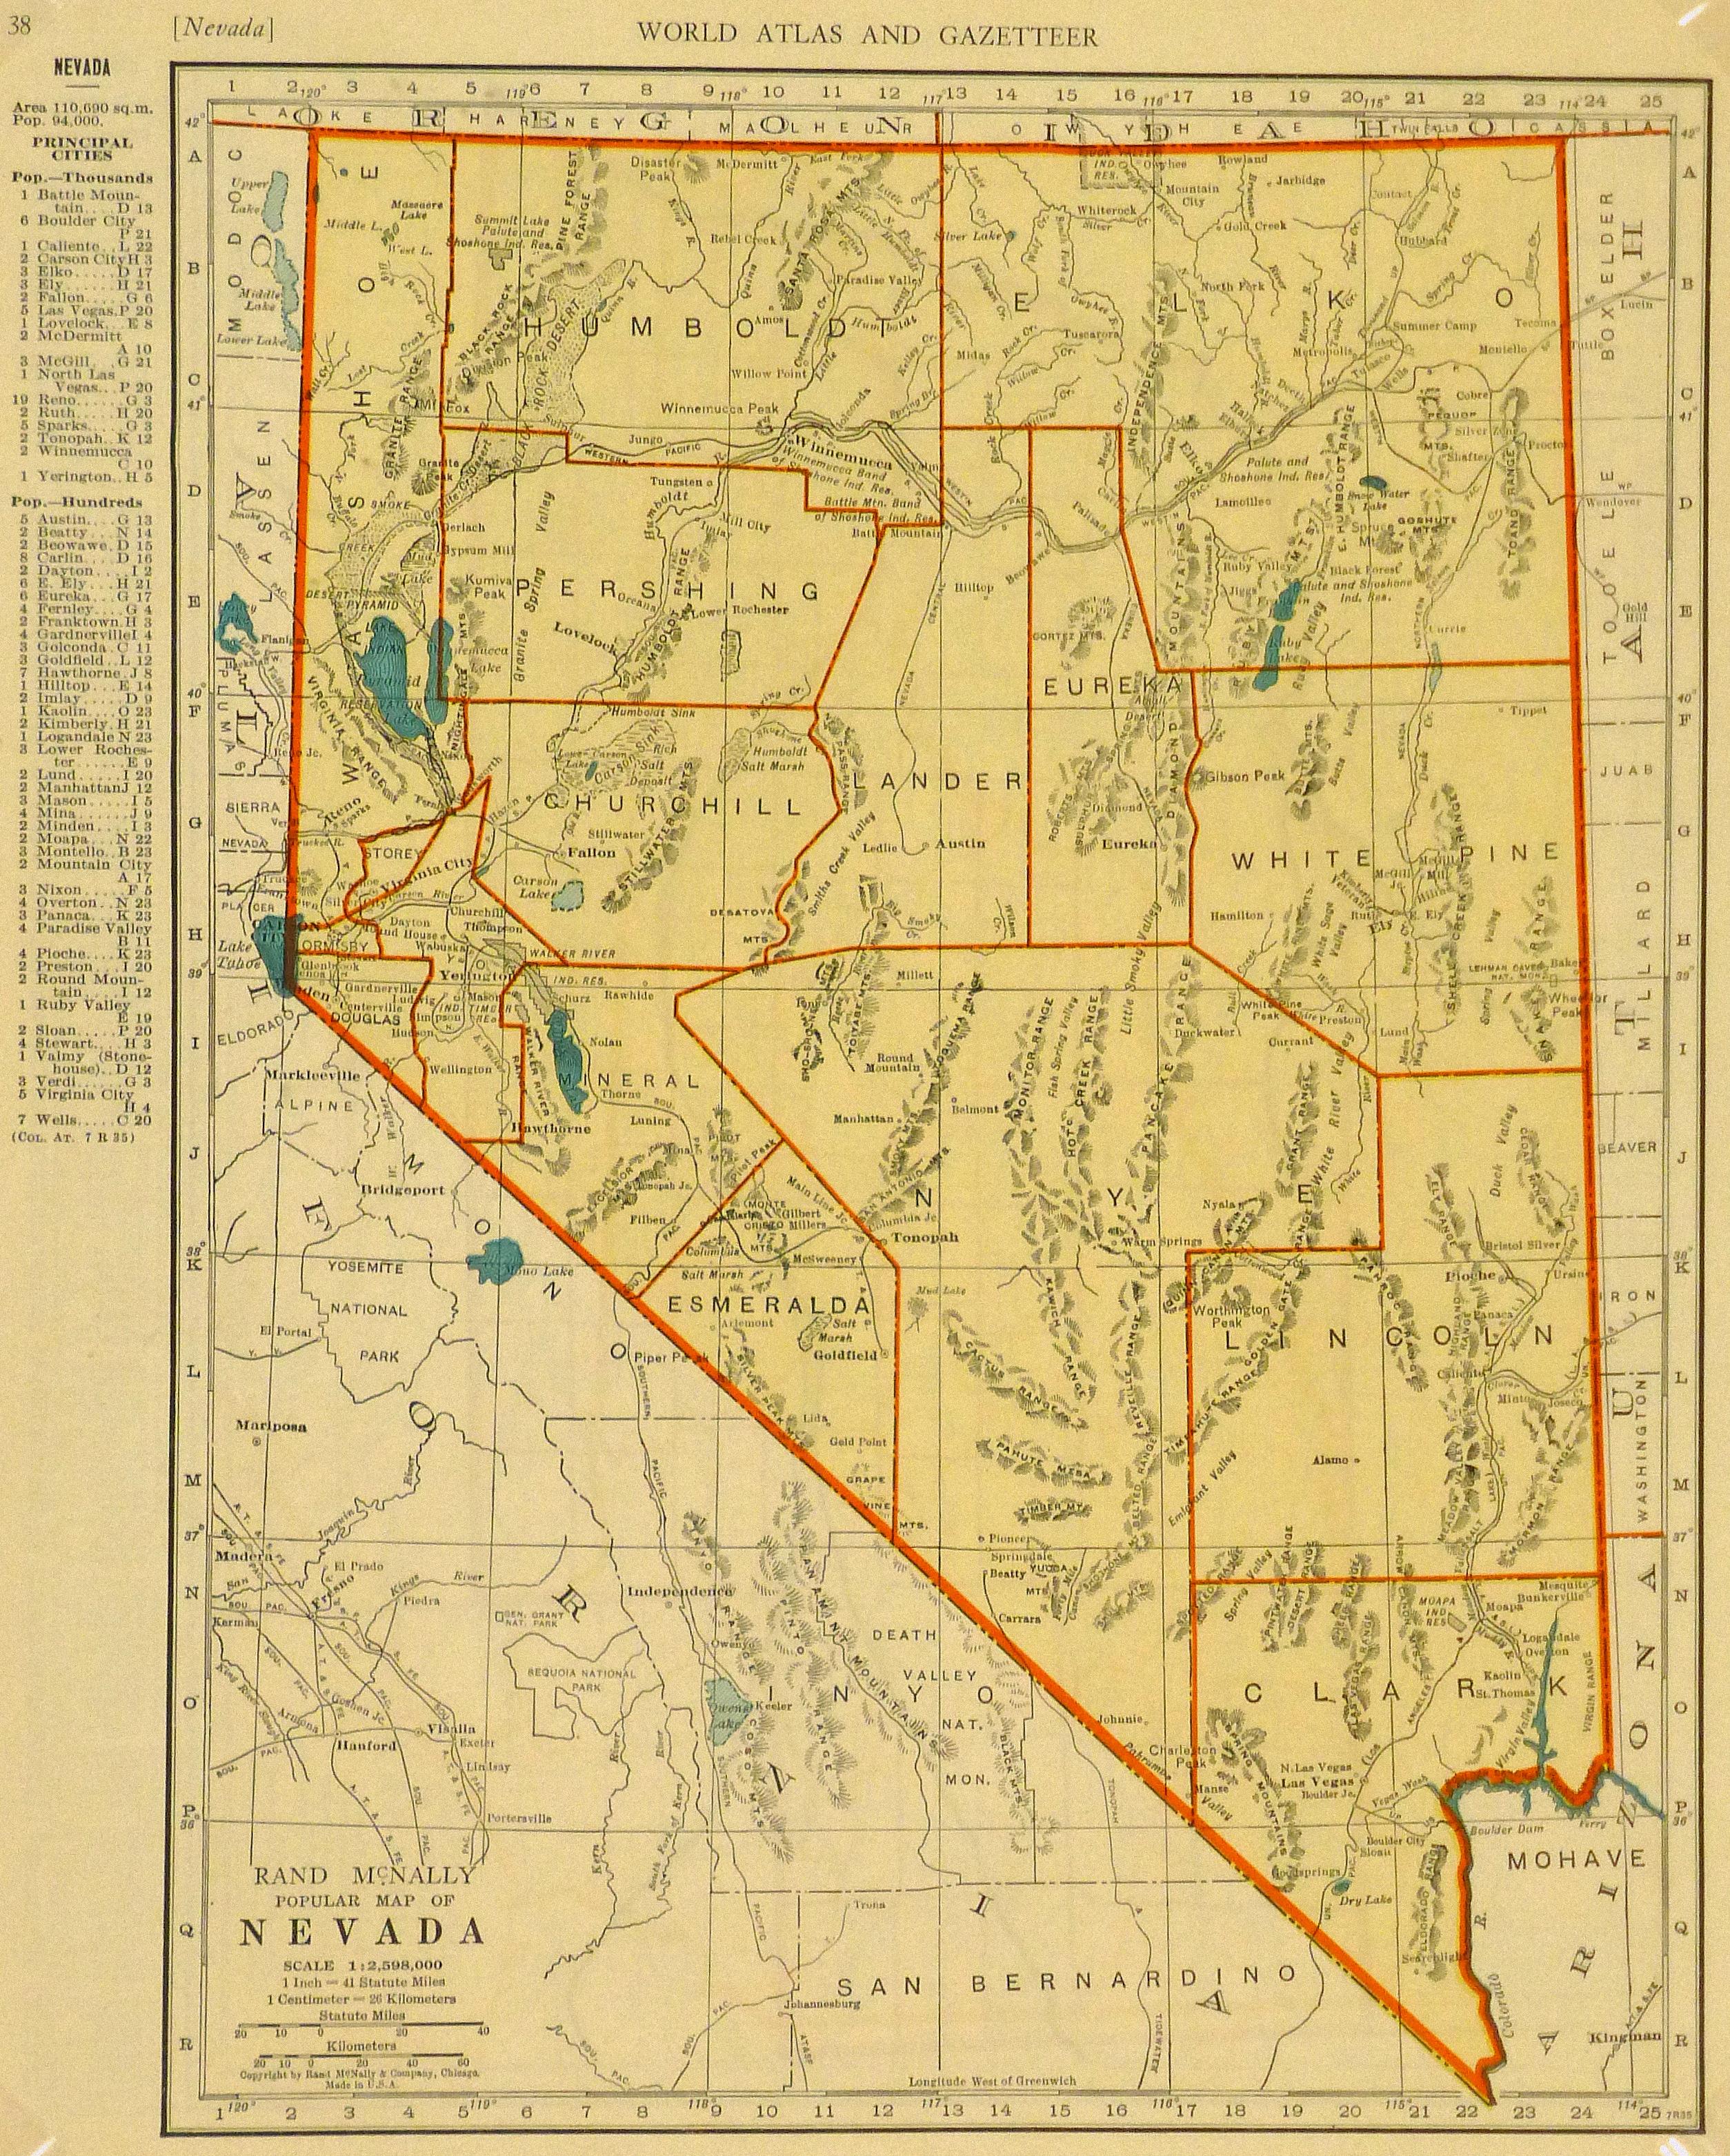 Map of Nevada, 1937-main-8704K